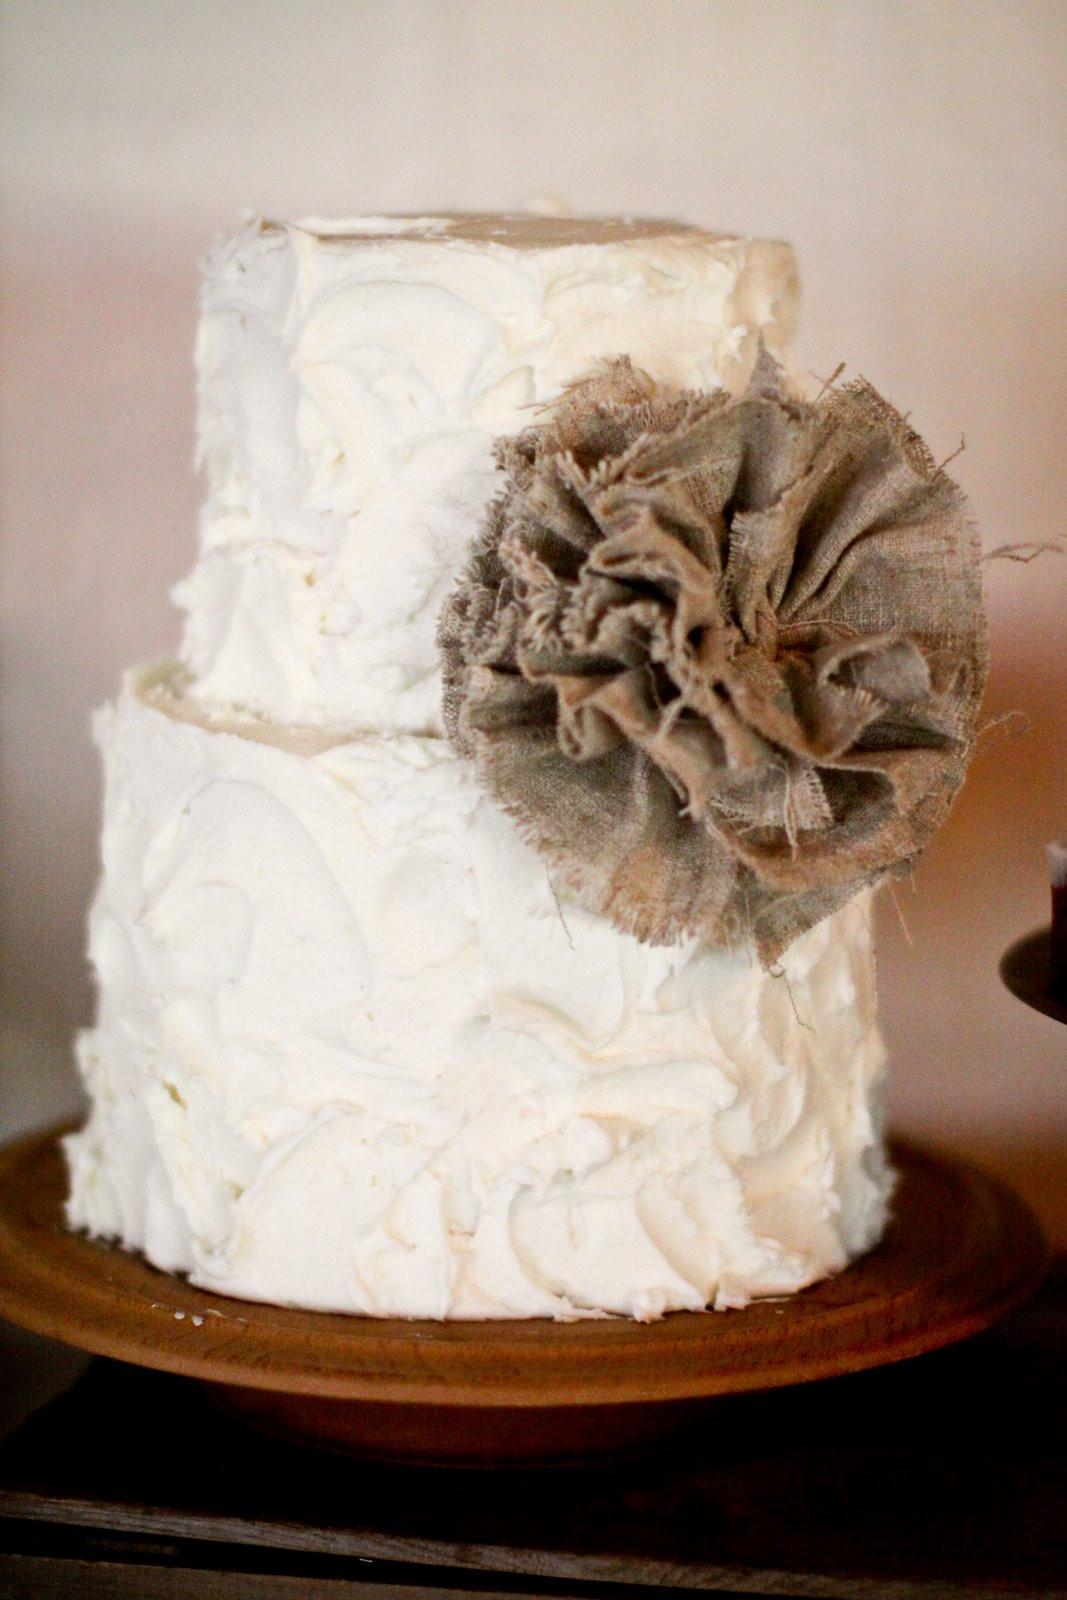 Burlap Wedding Cakes  Kara s Party Ideas Burlap and Lace Wedding Dessert Table